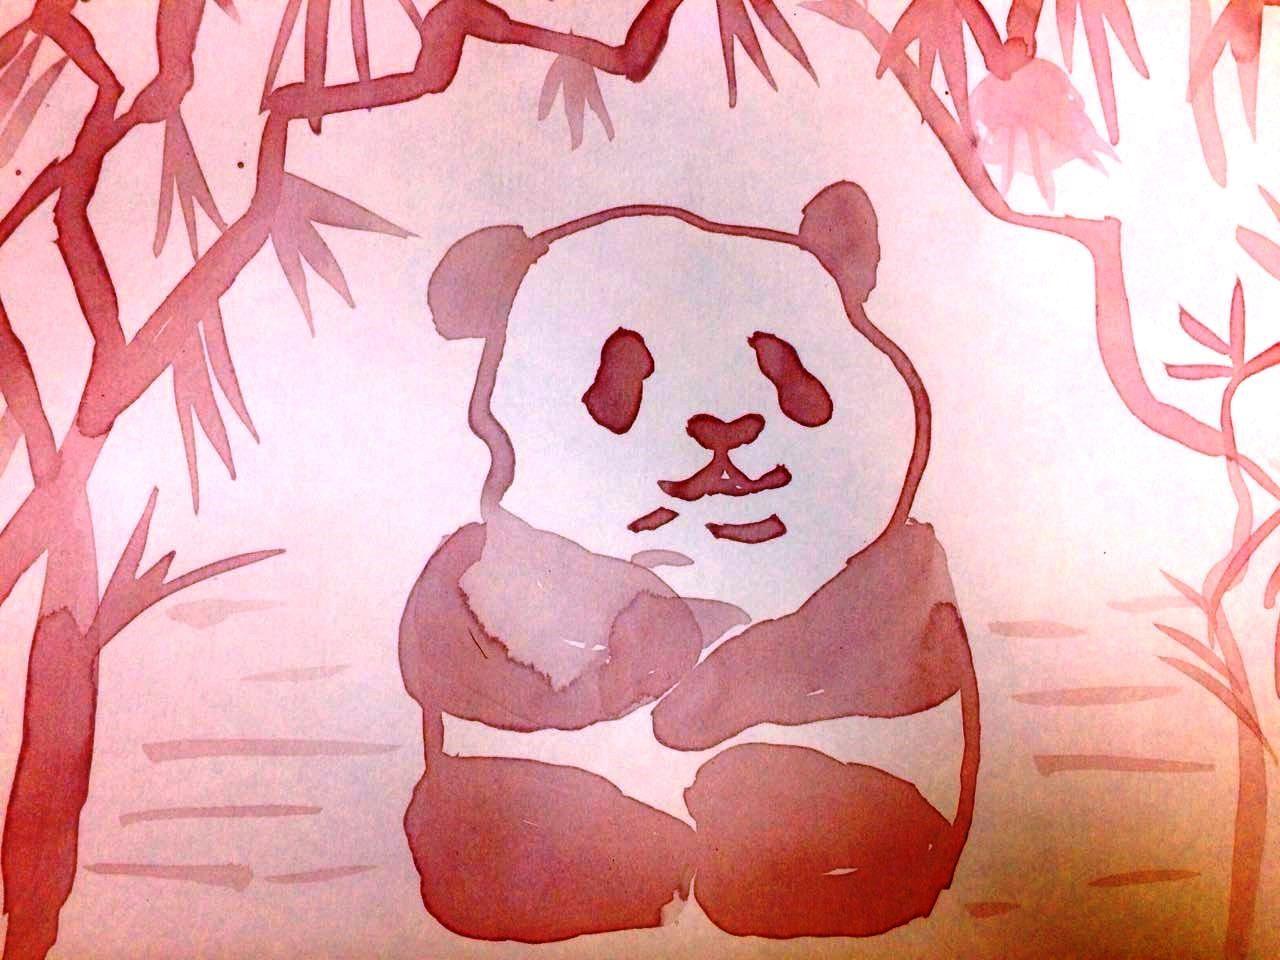 панда, нарисованная вином